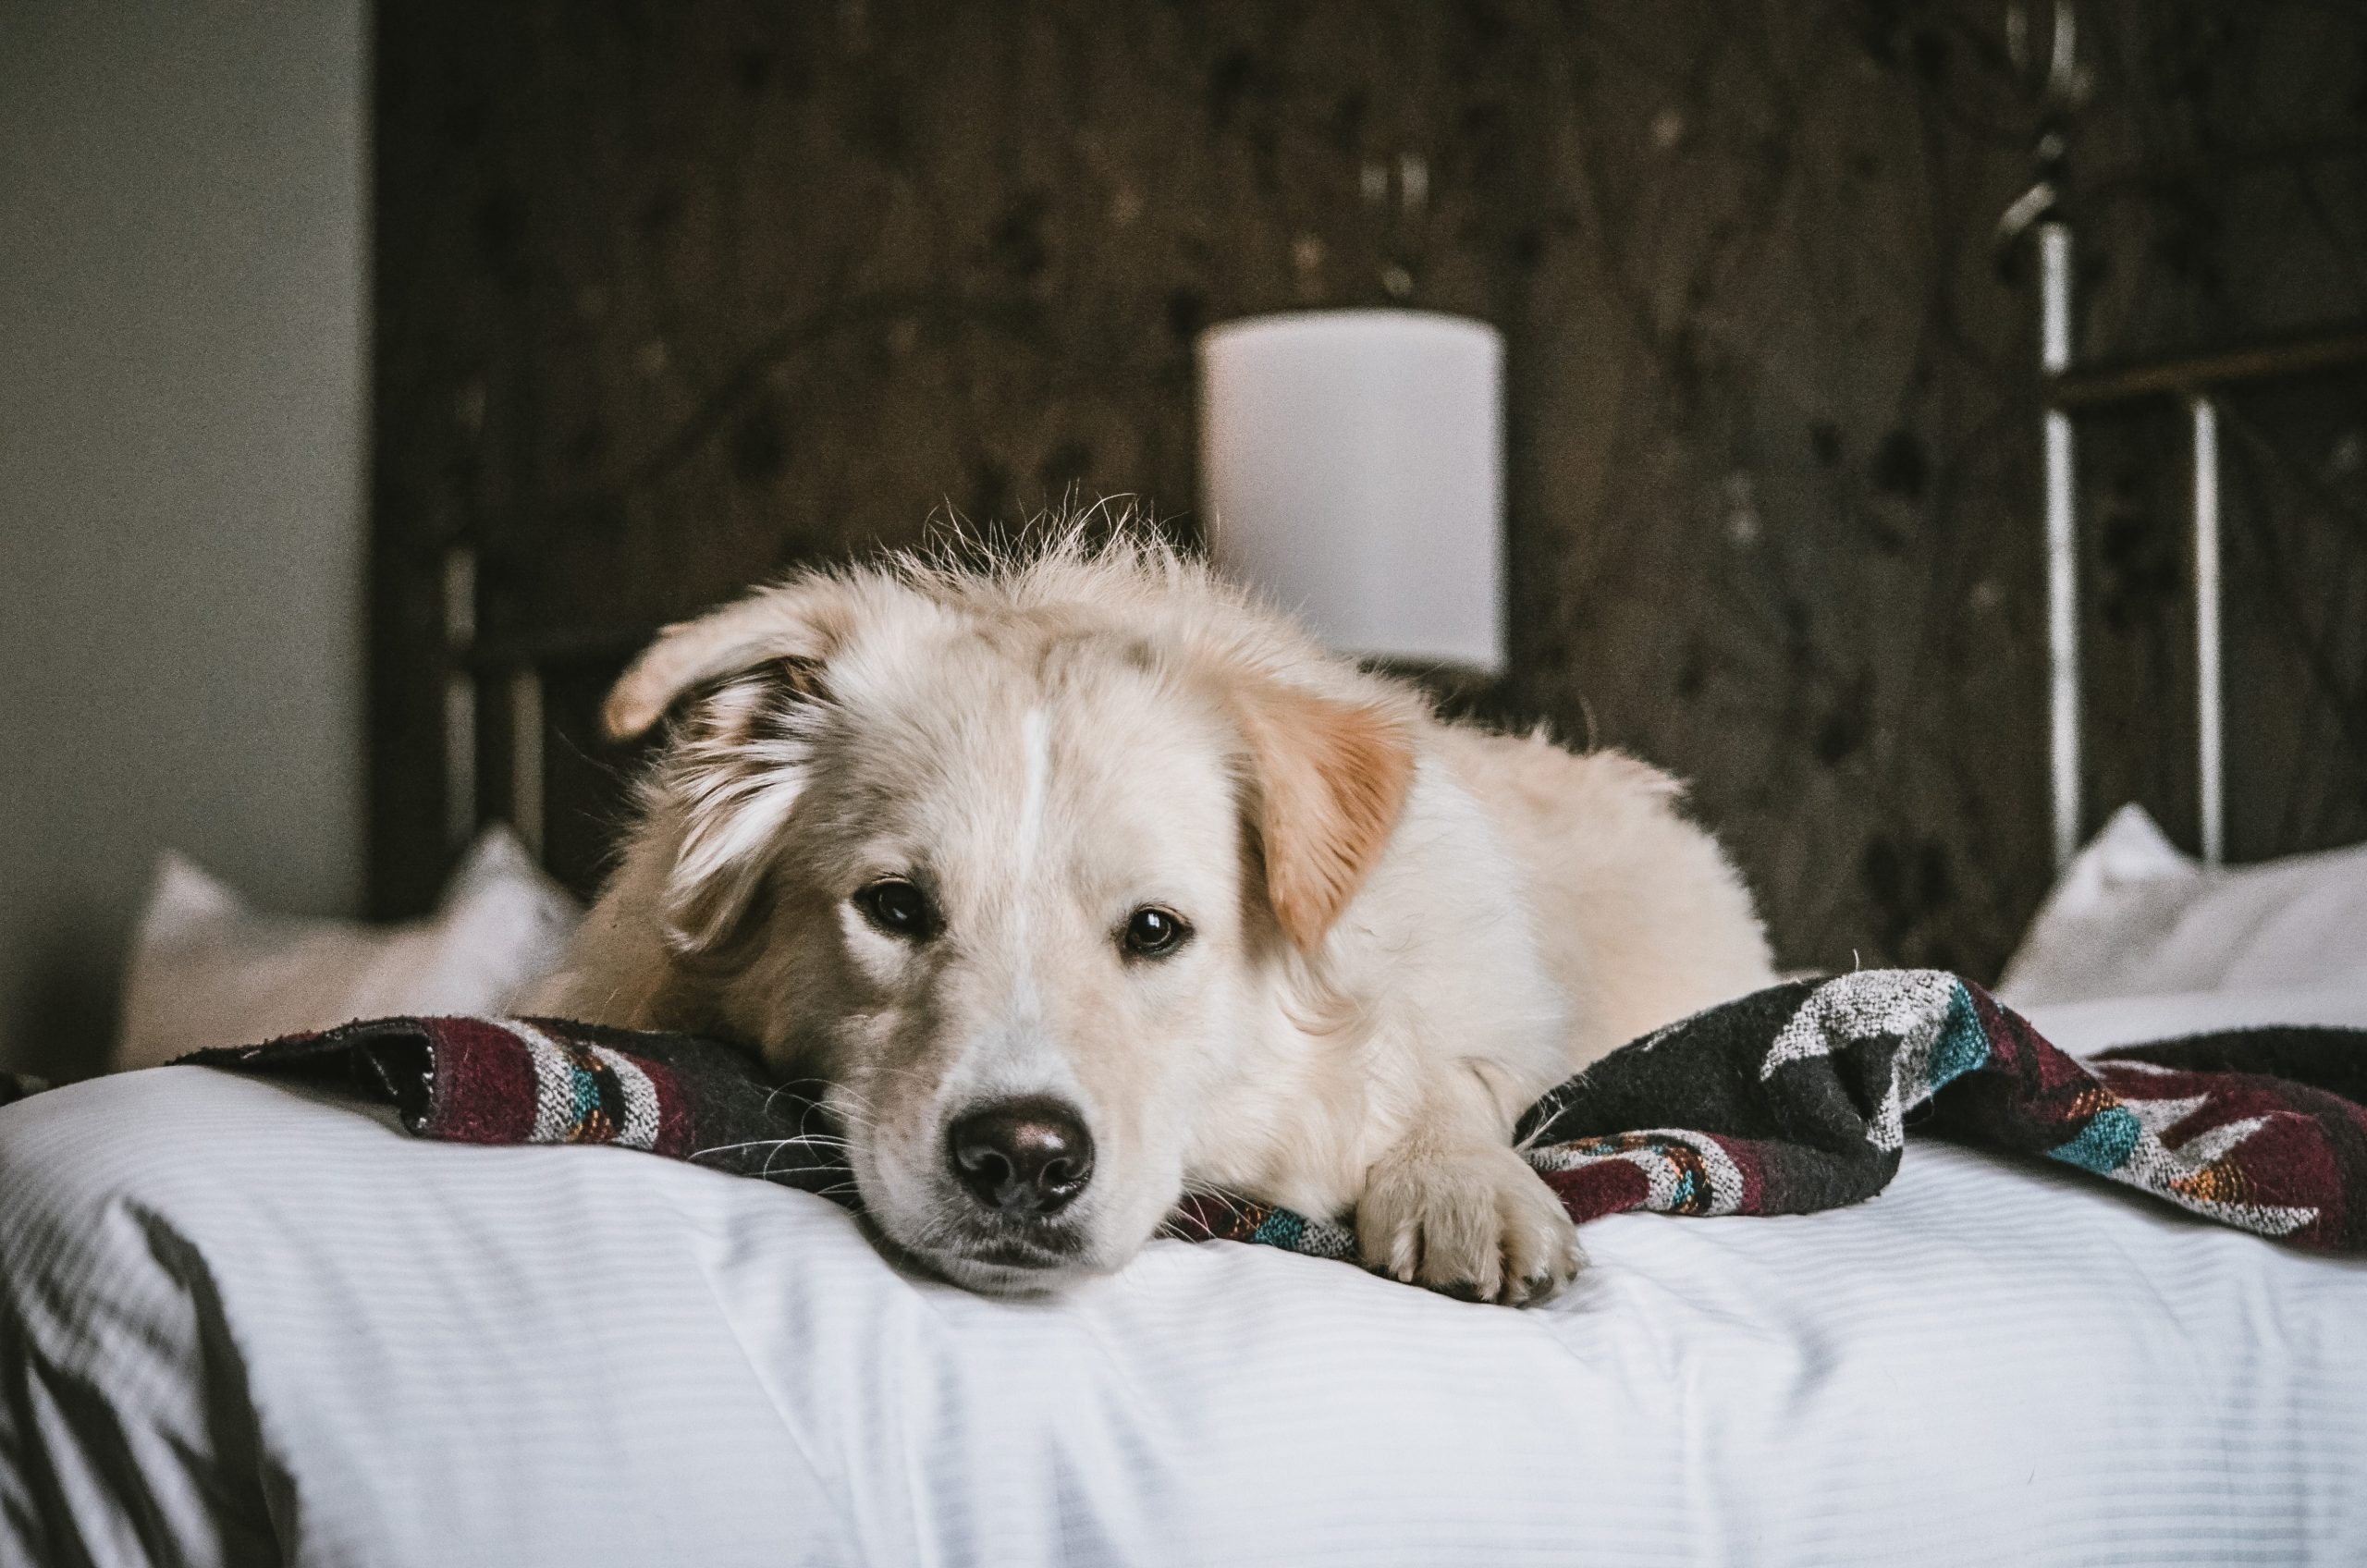 Dog-Chien-Charlot